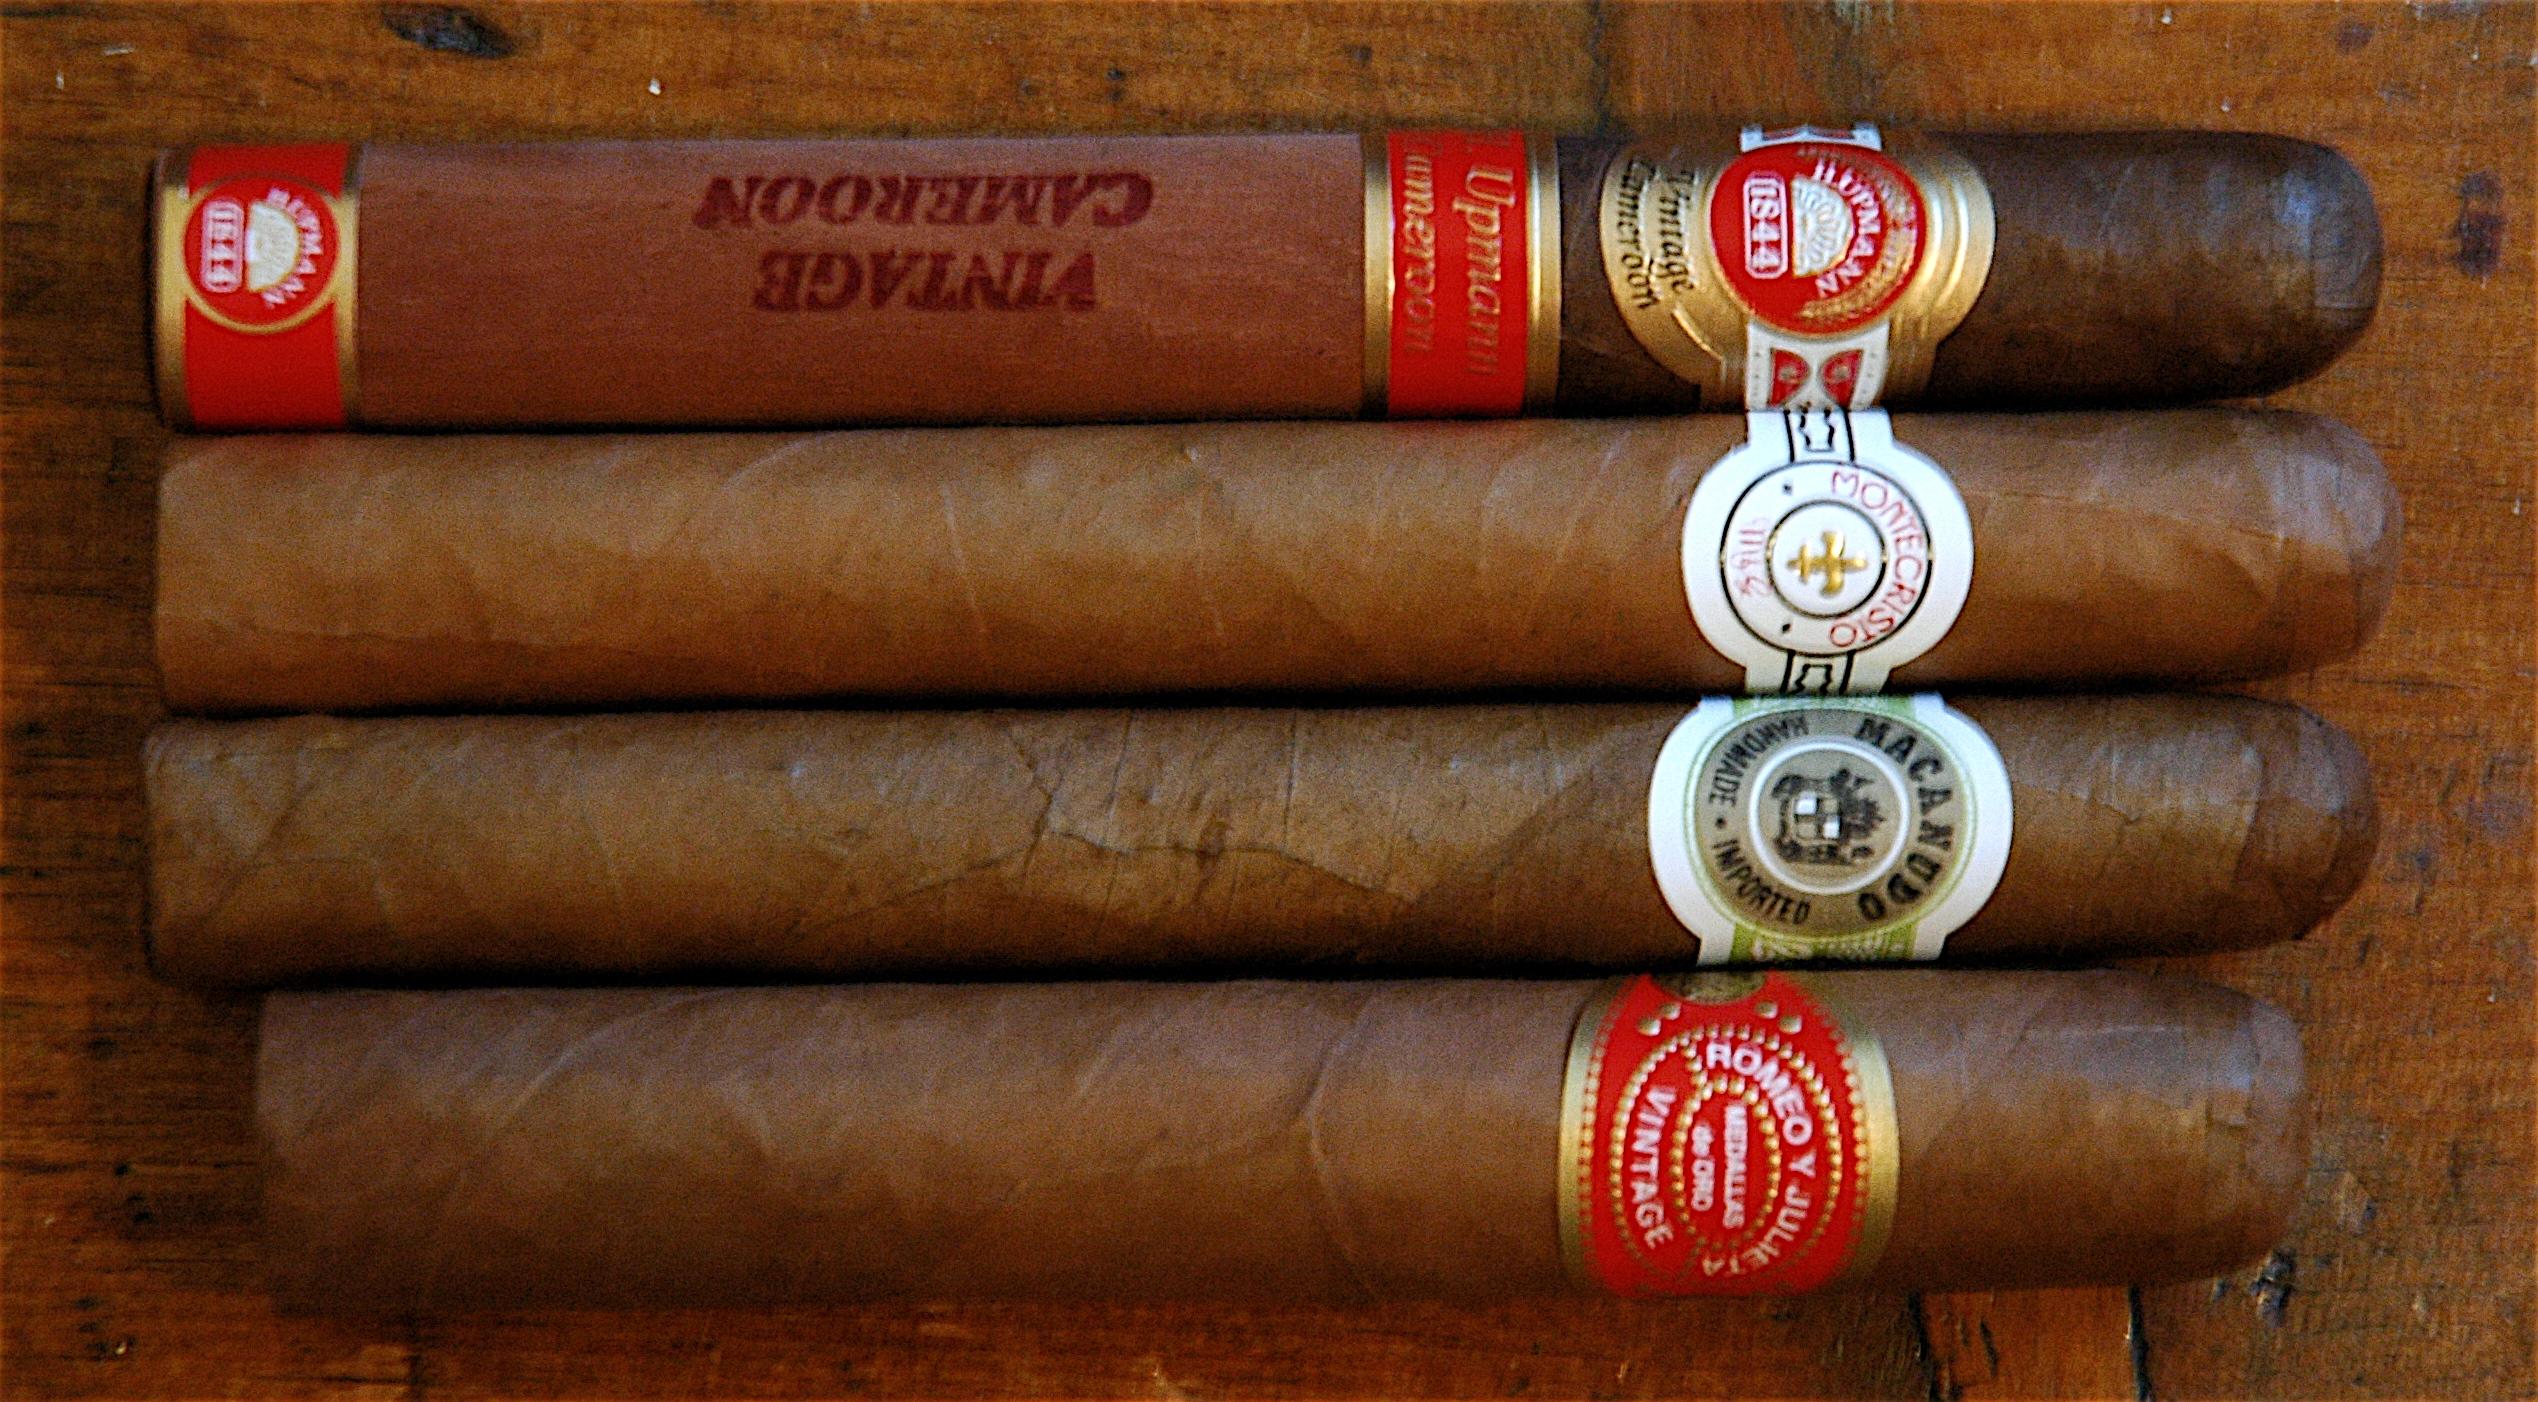 File:Four cigars.jpg - Wikipedia